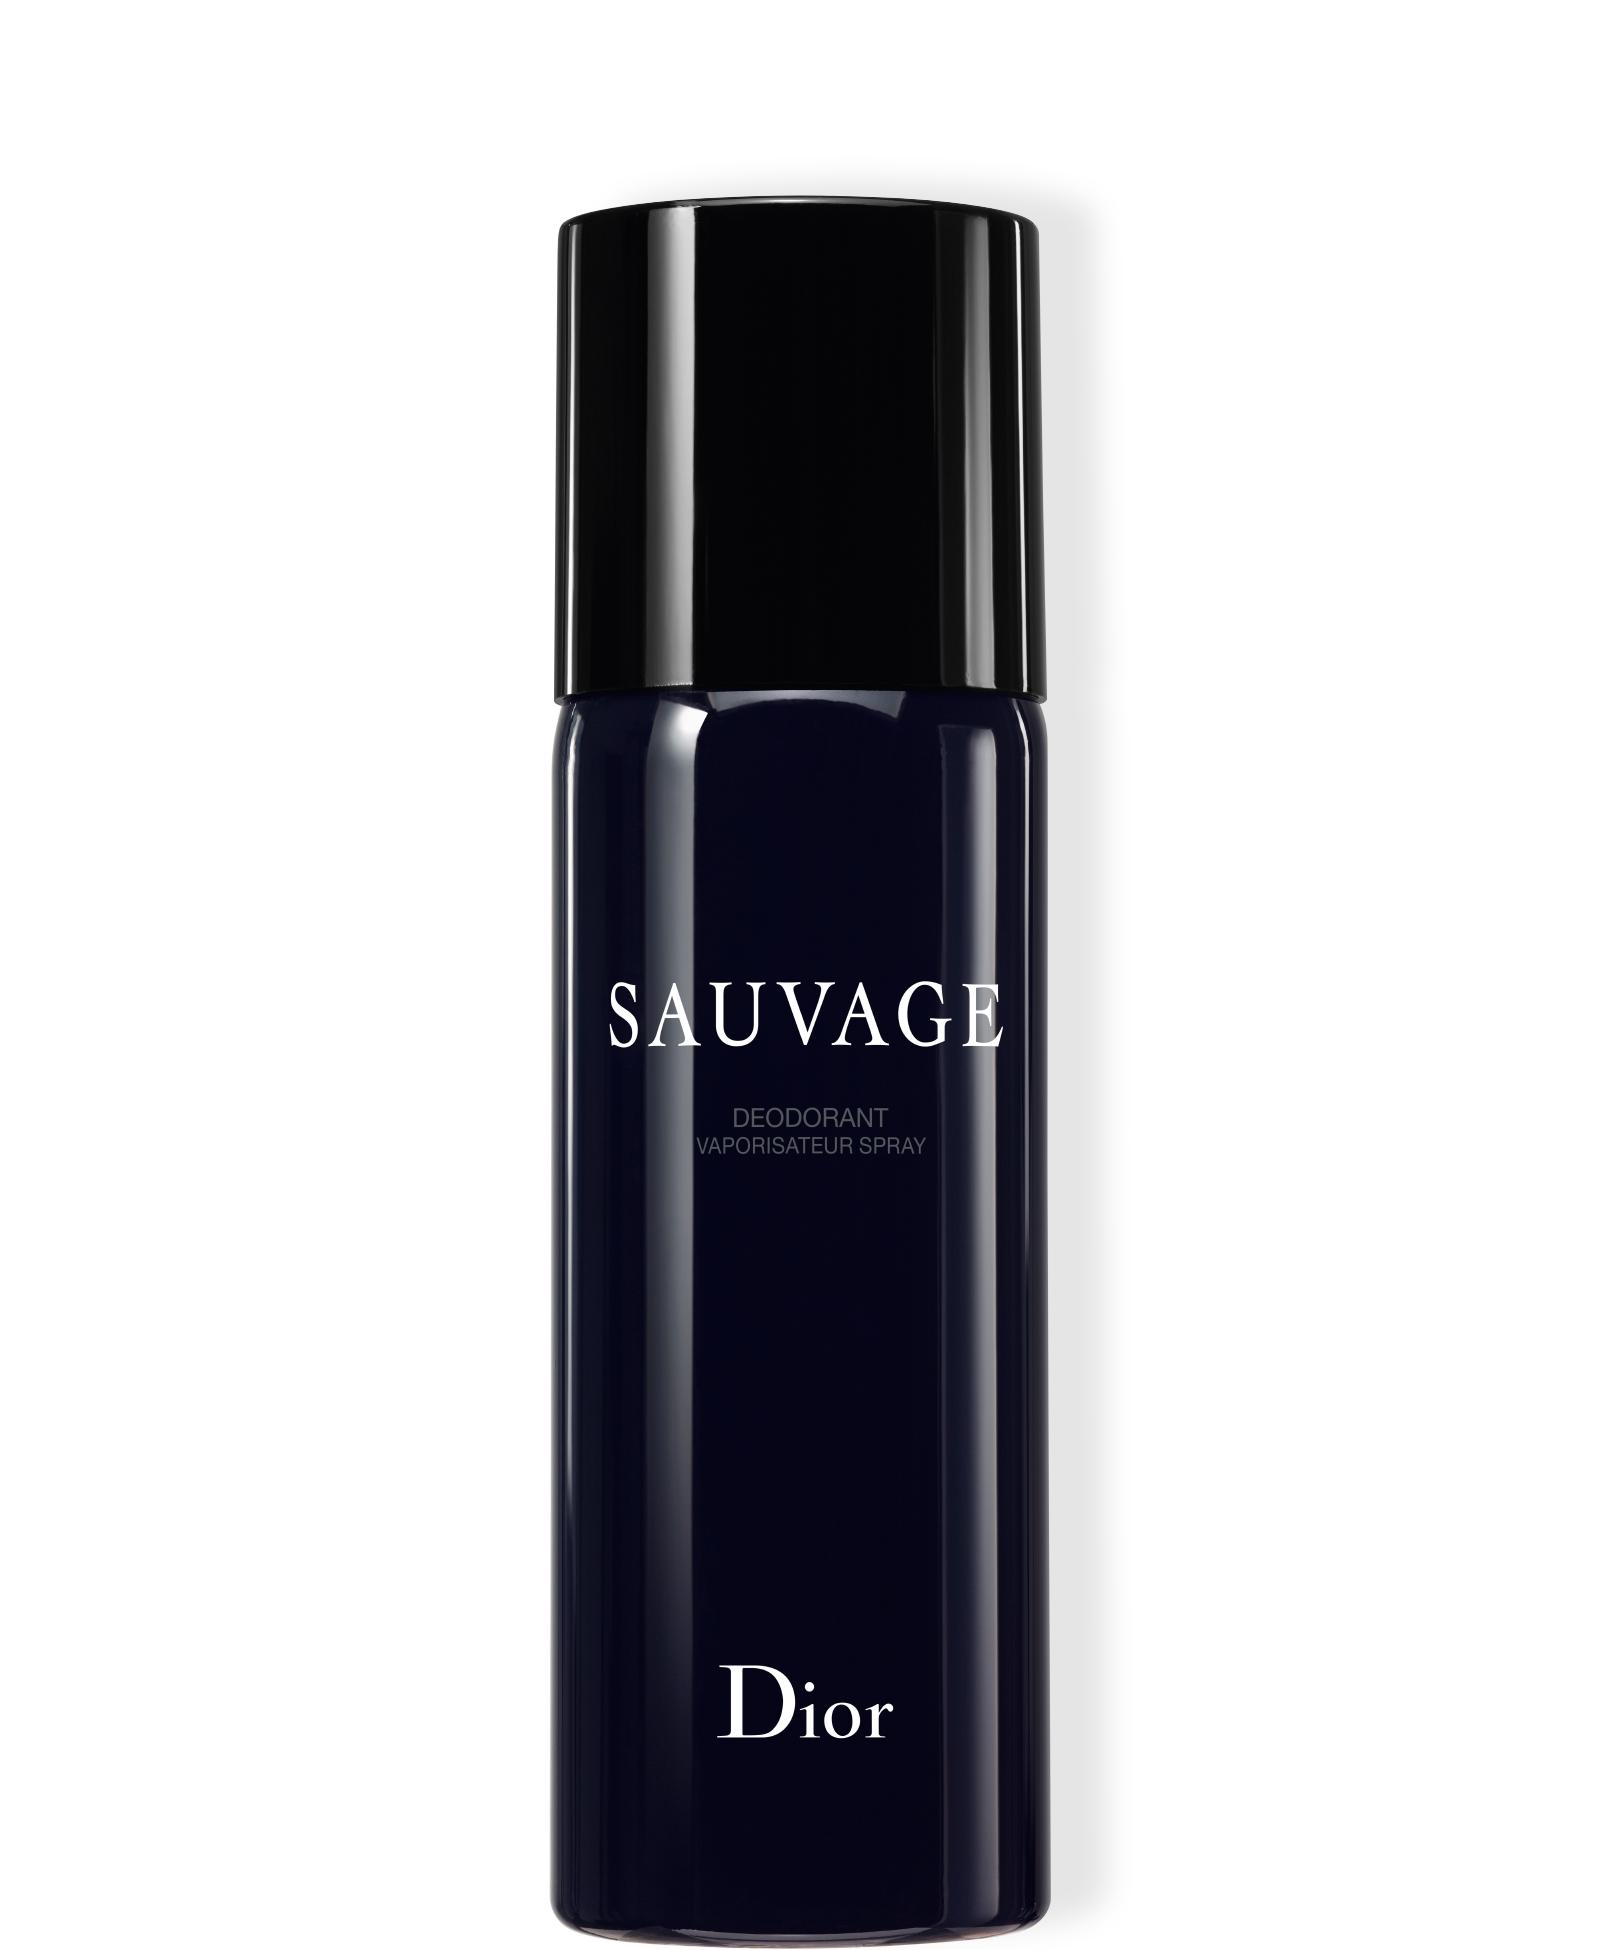 DIOR Sauvage Deodorant Spray, 150 ml